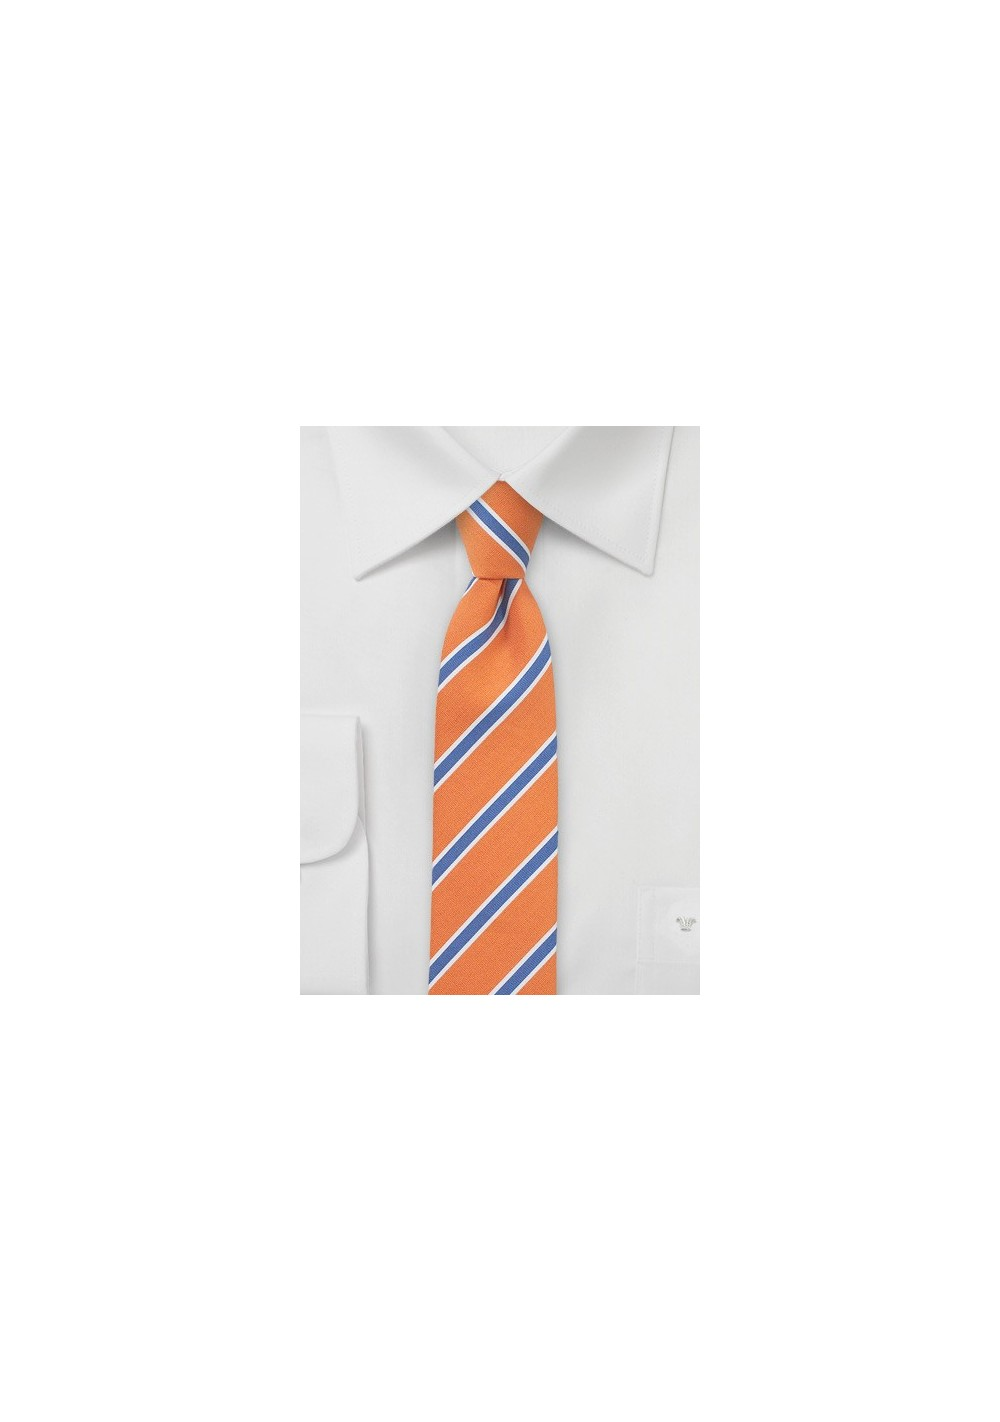 Skinny Linen Tie in Tangerine and Blue